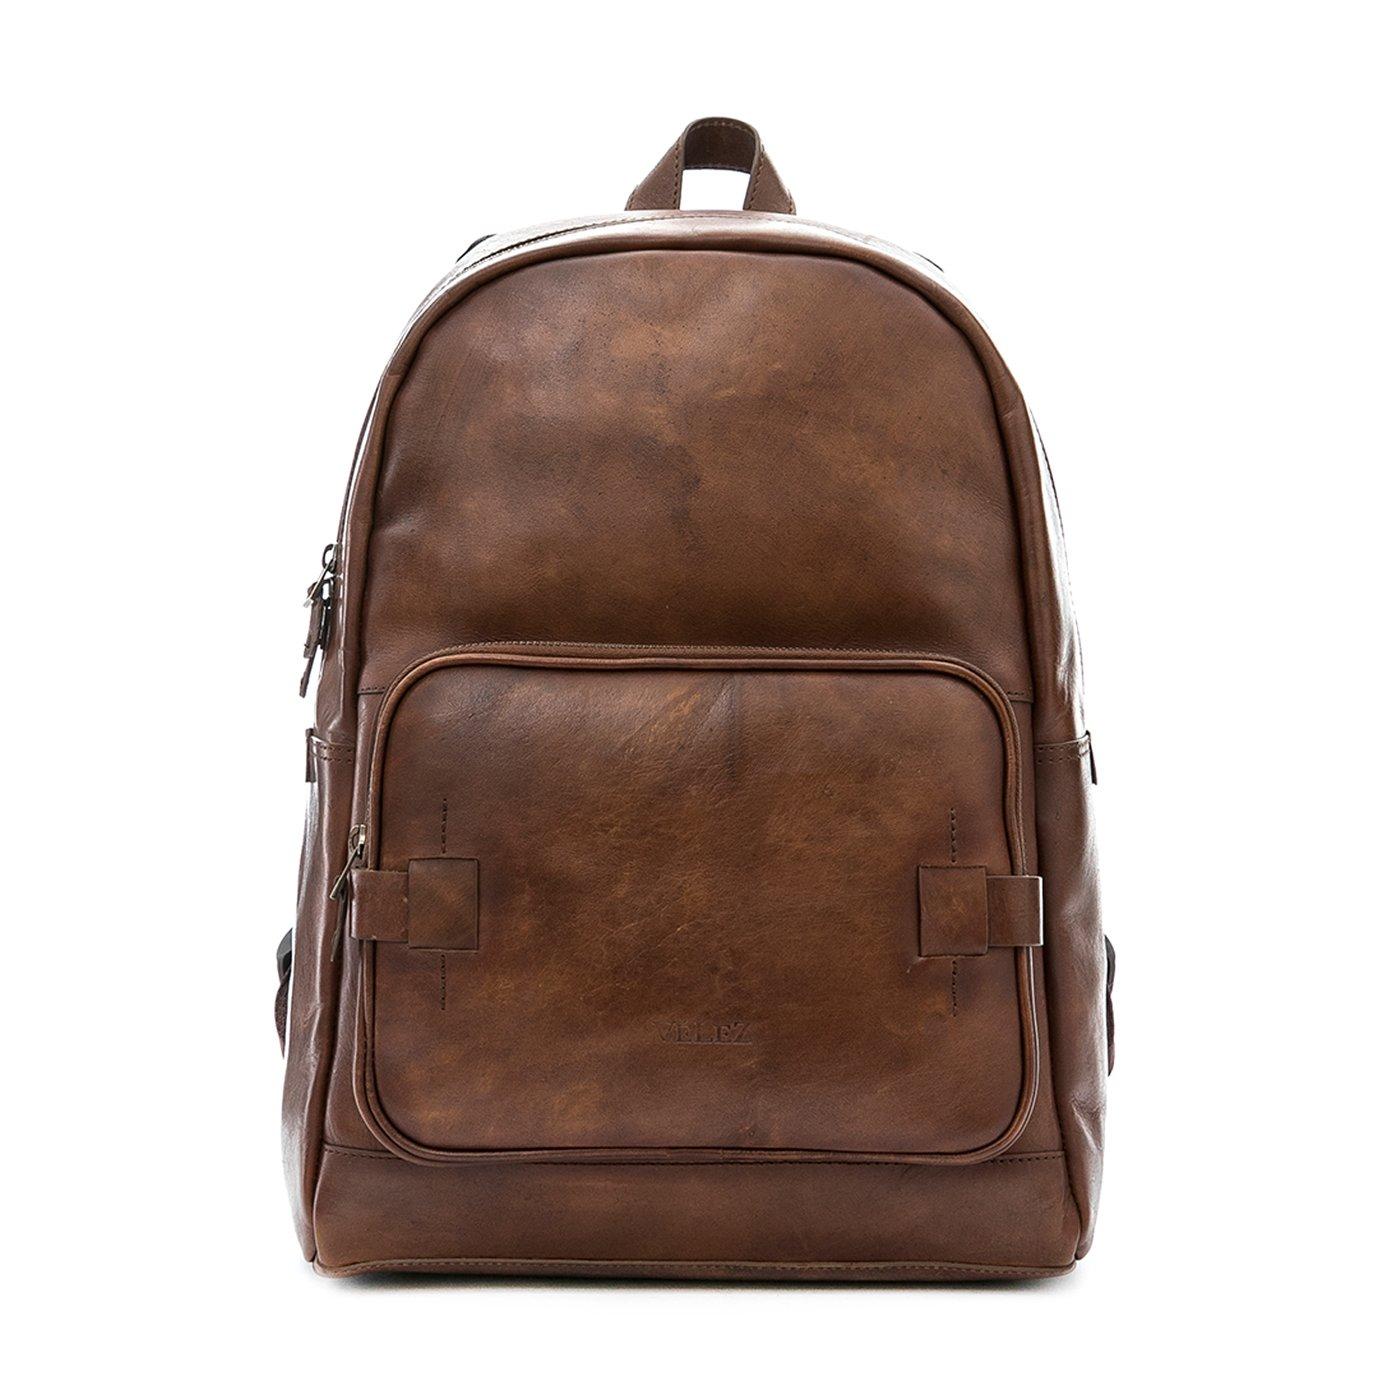 Amazon.com | Velez Mens Waterproof Backpack | Bolsos Impermeables para Hombres | Backpacks